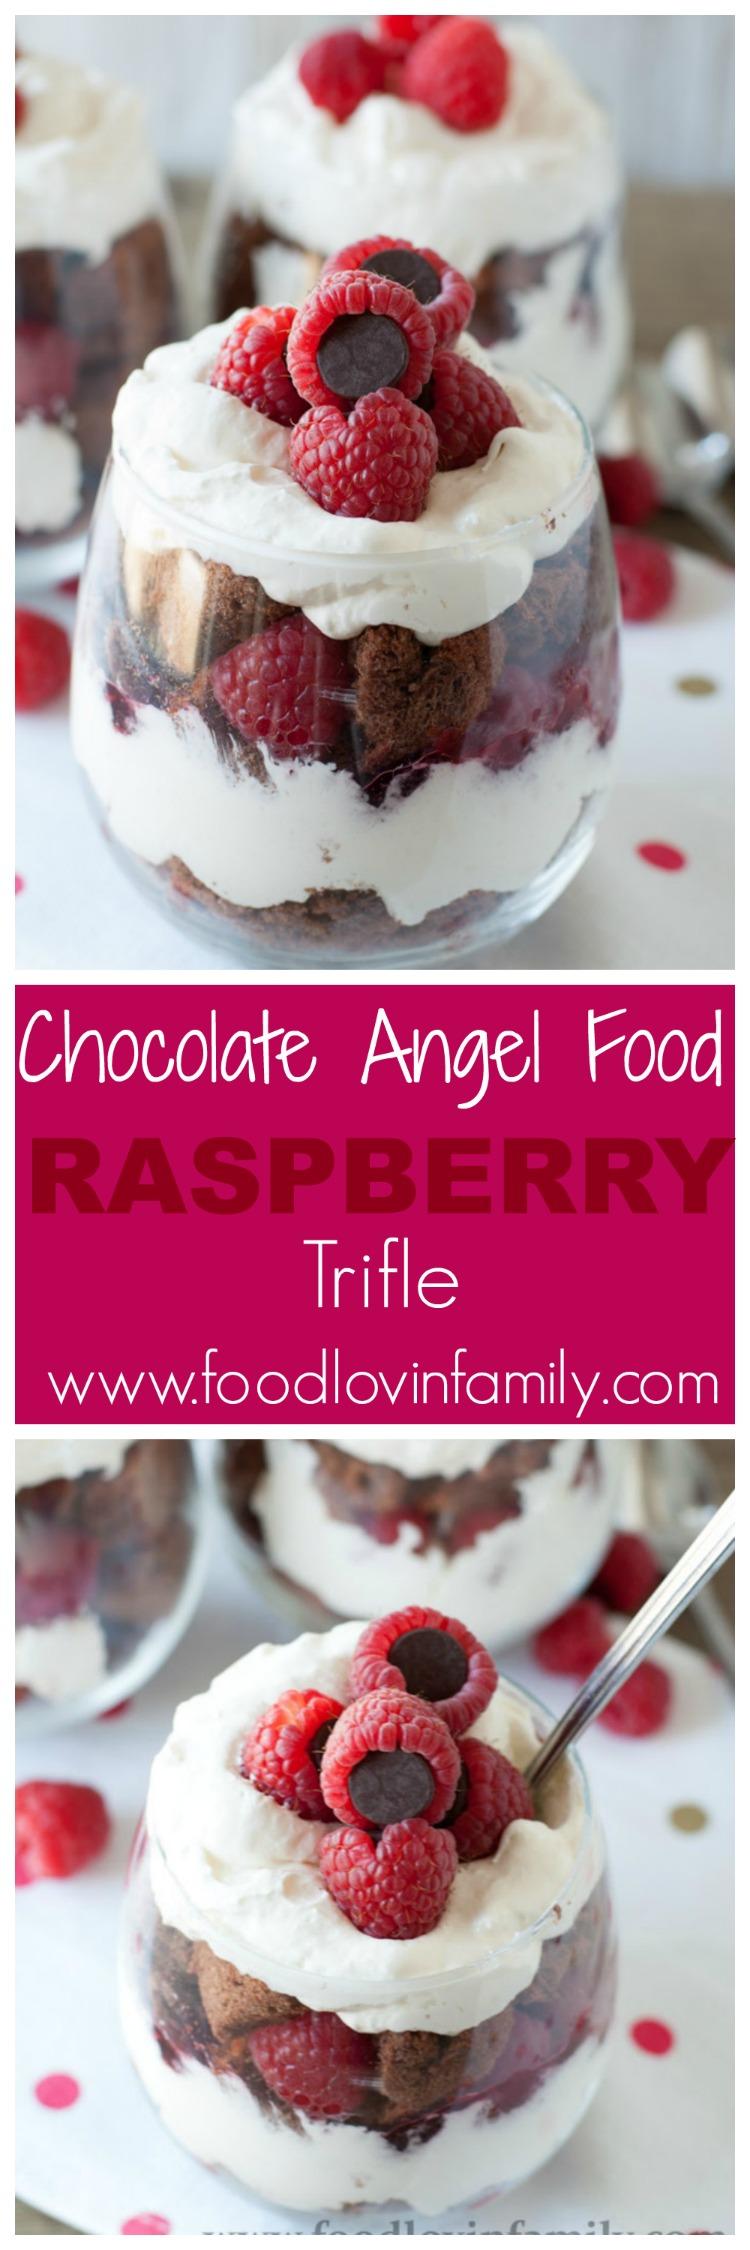 Easy Chocolate Angel Food Cake + Raspberry Trifle - Food Lovin Family